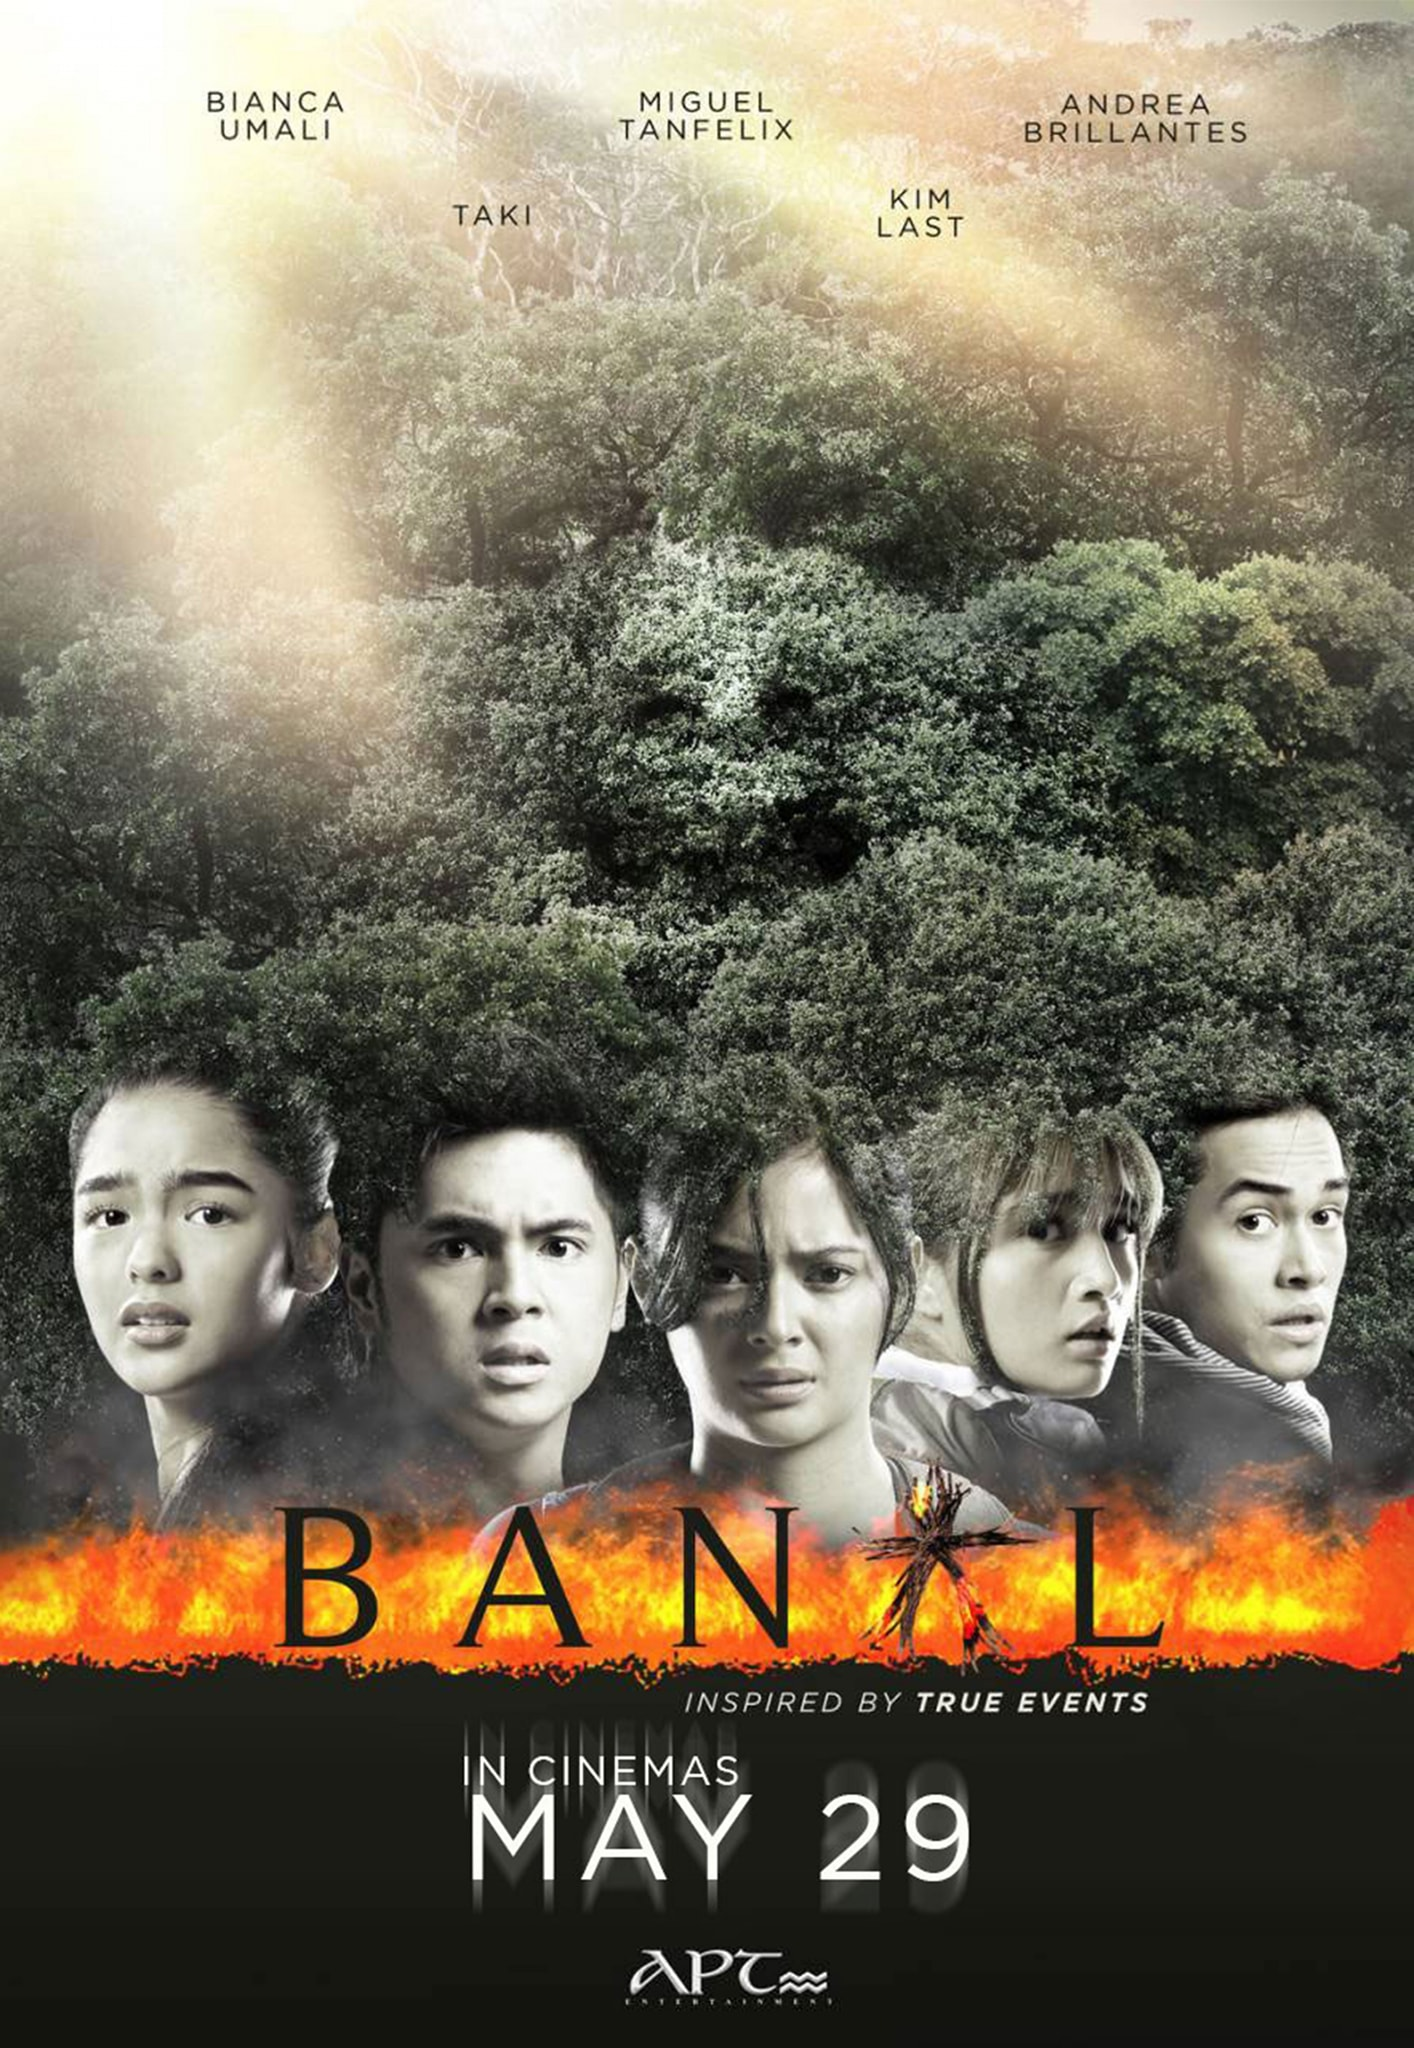 Miguel Tanfelix, Andrea Brillantes, Bianca Umali, Kim Last, and Taki Saito in Banal (2019)